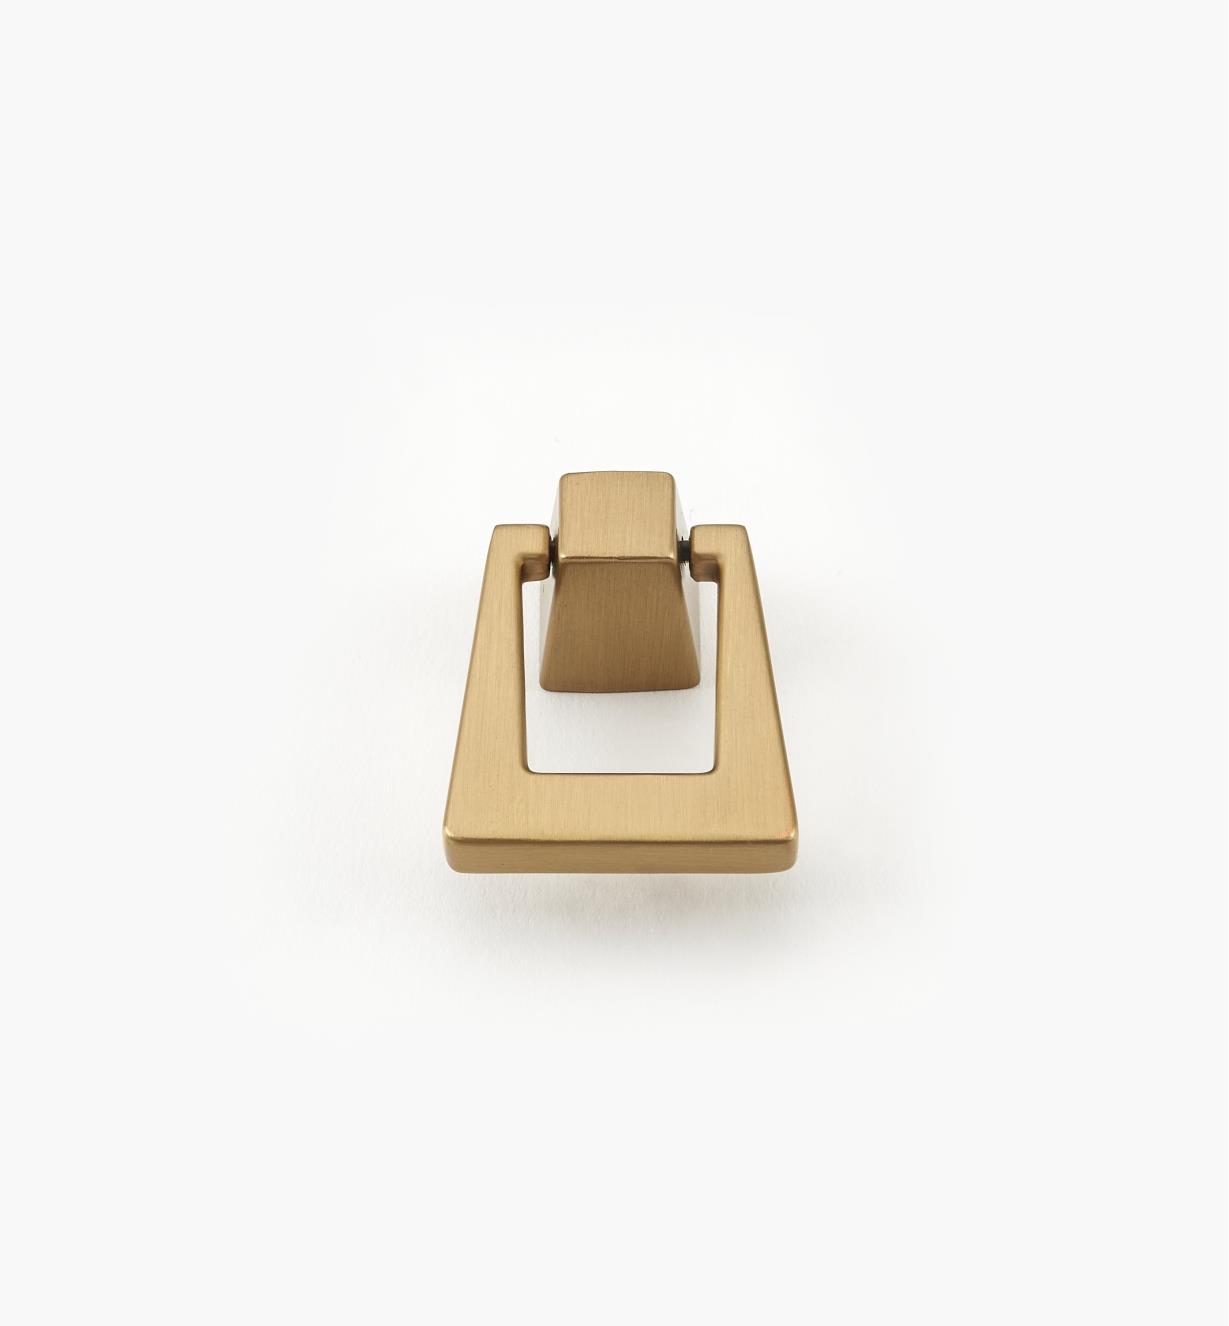 "02A1784 - Blackrock Golden Champagne 1 3/8"" x 1 3/4"" Pendulum Pull, each"